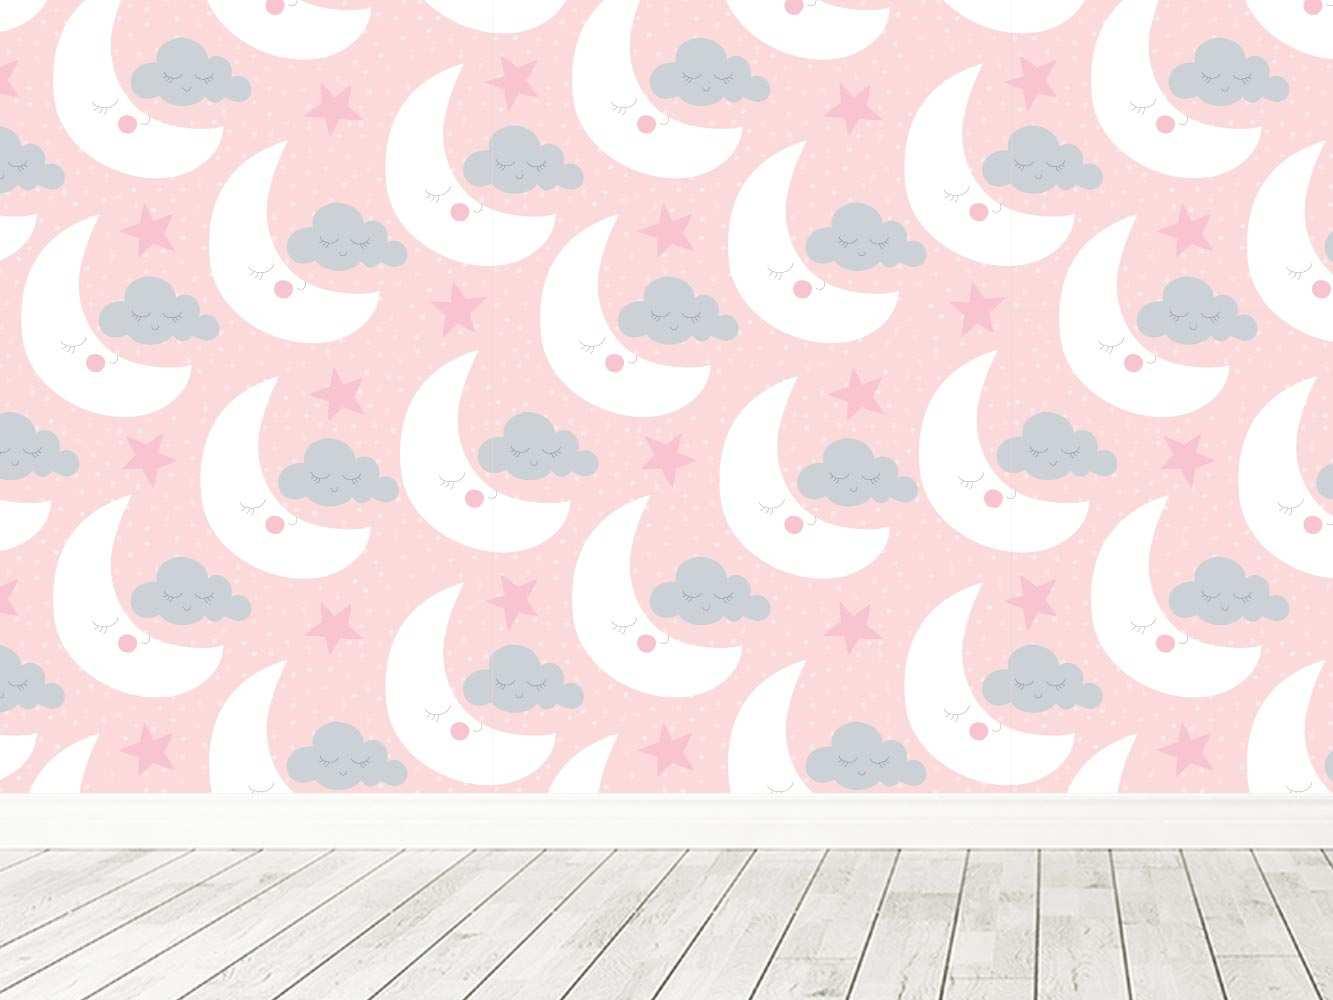 Fotomural Vinilo Infantil Lunas Nubes Durmiendo | Carteles XXL - Impresión carteleria publicitaria